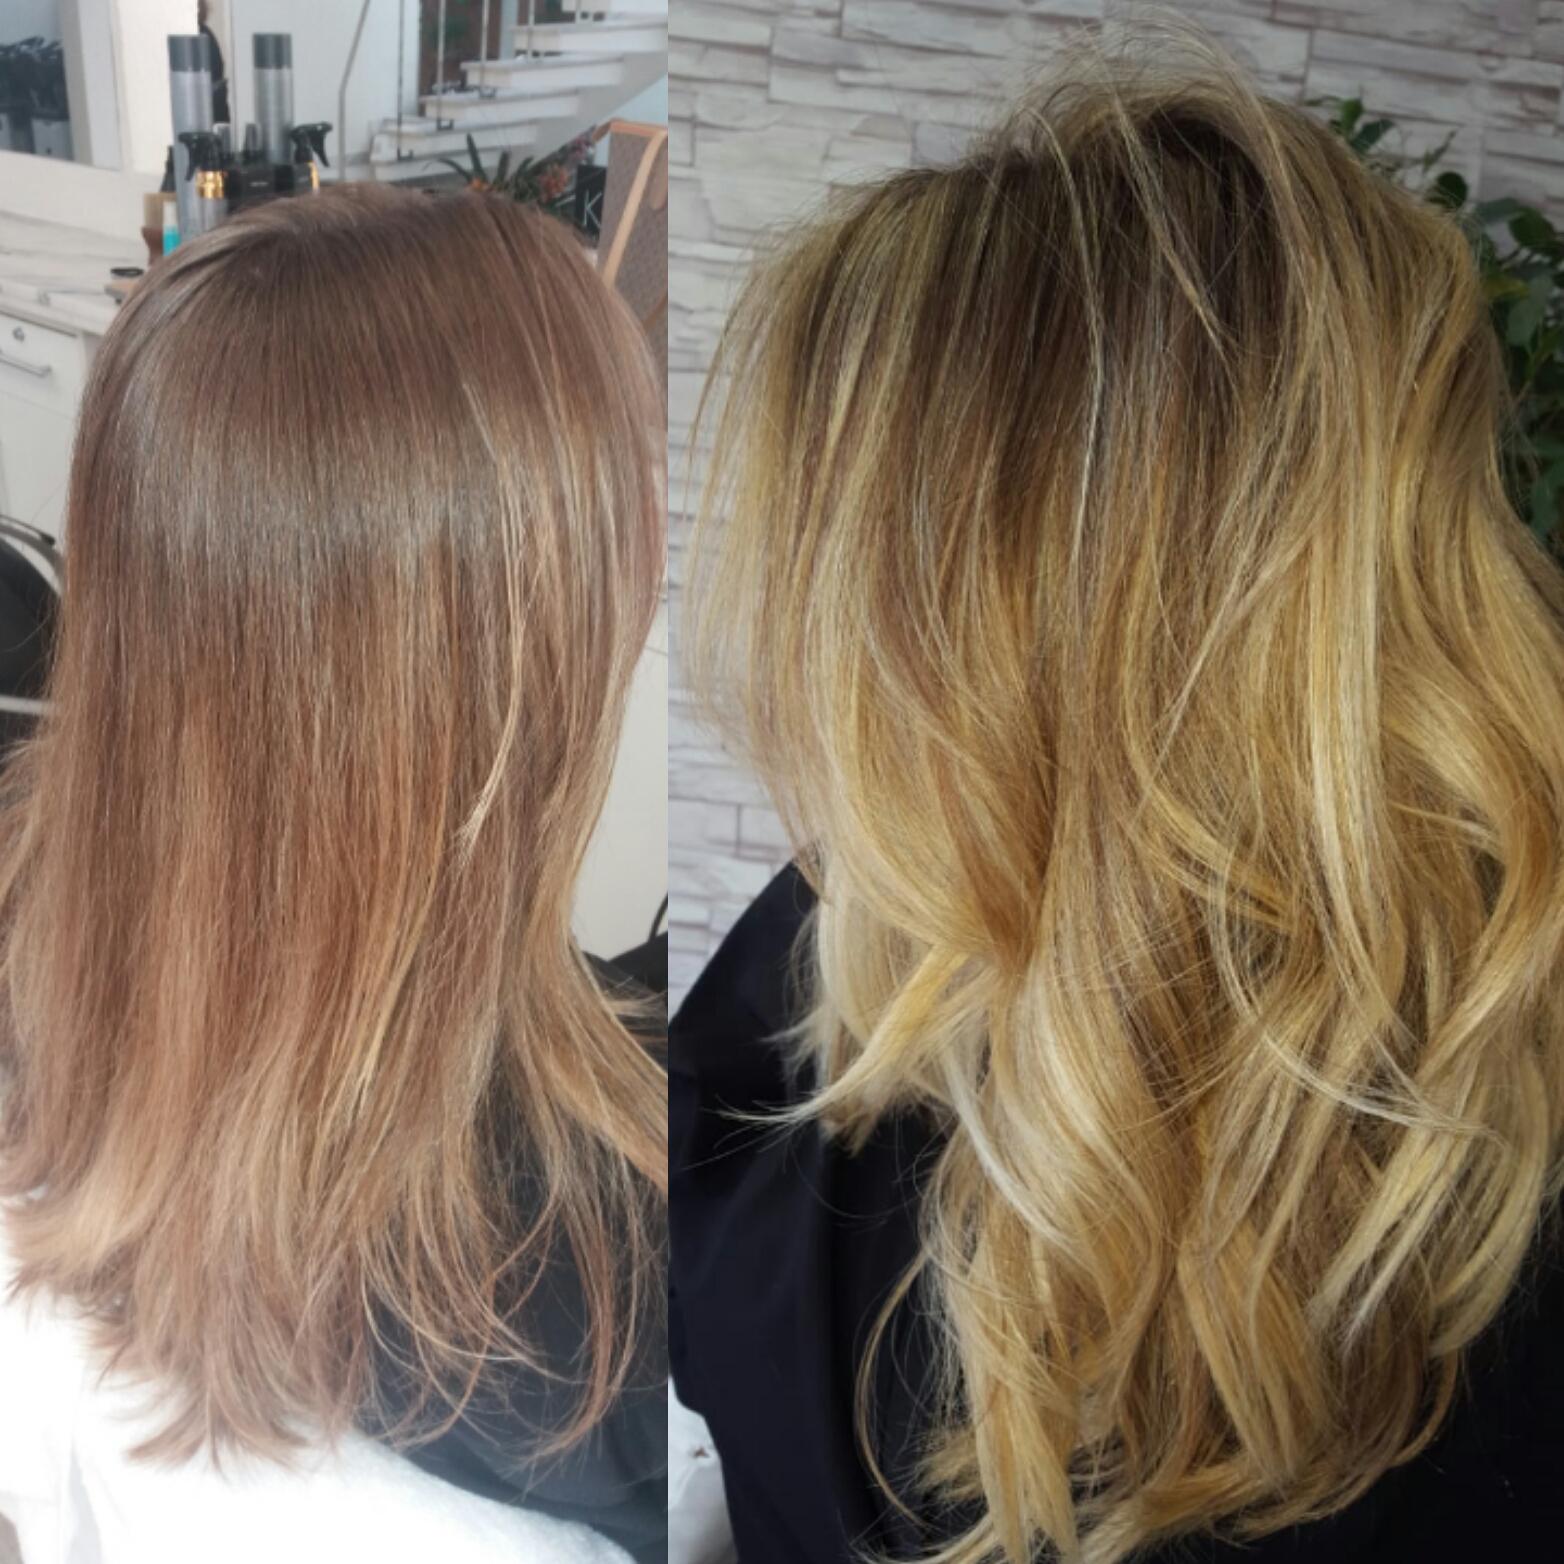 #liacoiffure antes e depois loiro dourado  corte é mechas #highlight  cabeleireiro(a)